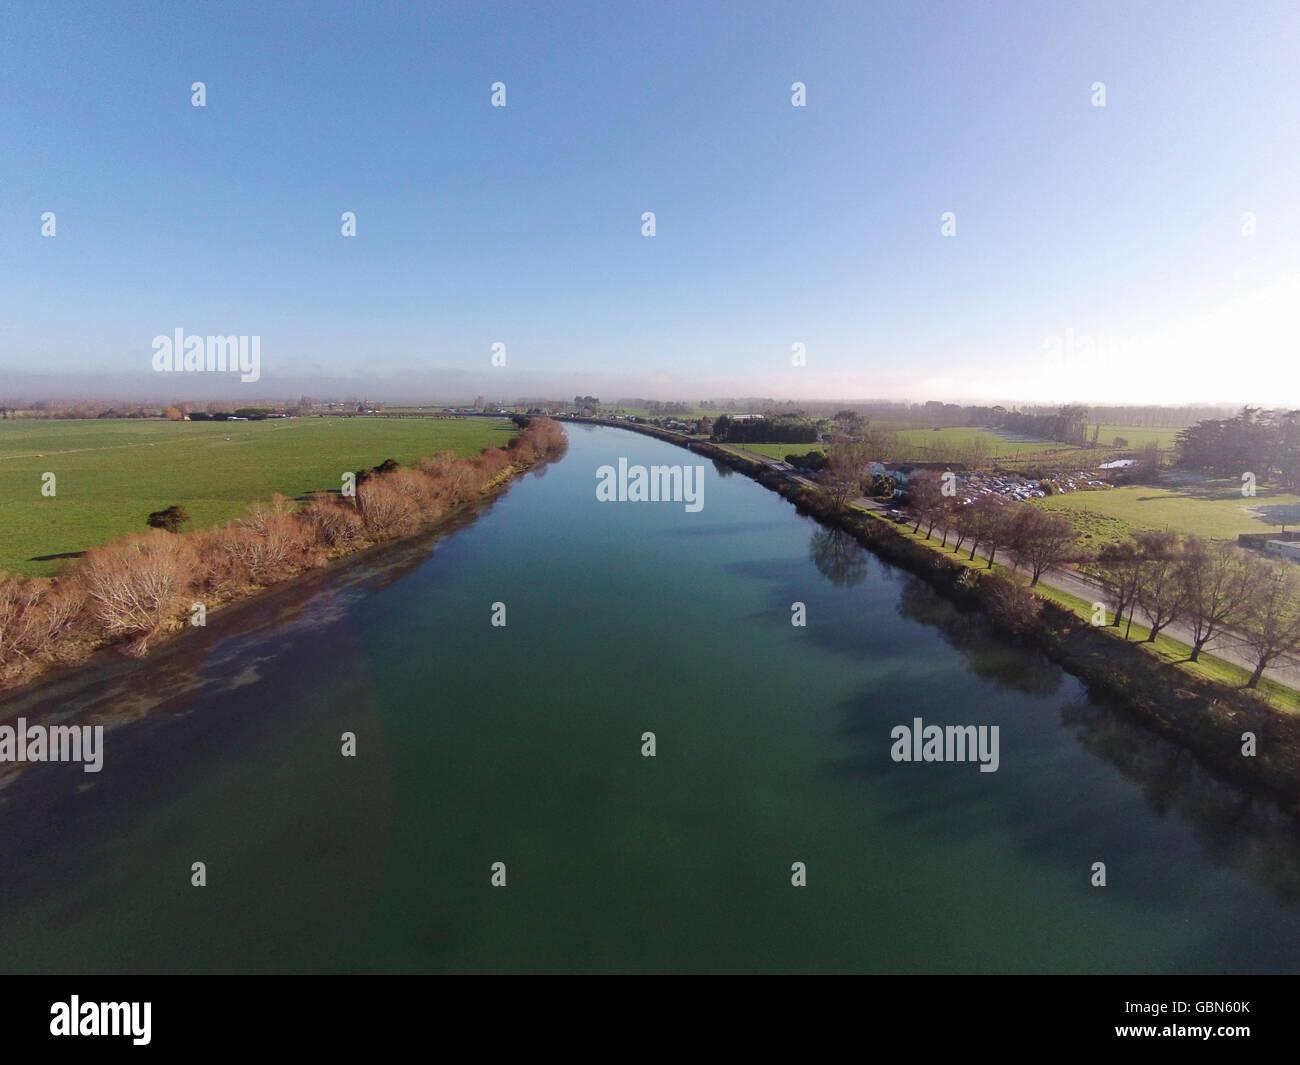 Clutha River at Kaitangata, near Balclutha, Clutha District, South Otago, South Island, New Zealand - drone aerial Stock Photo